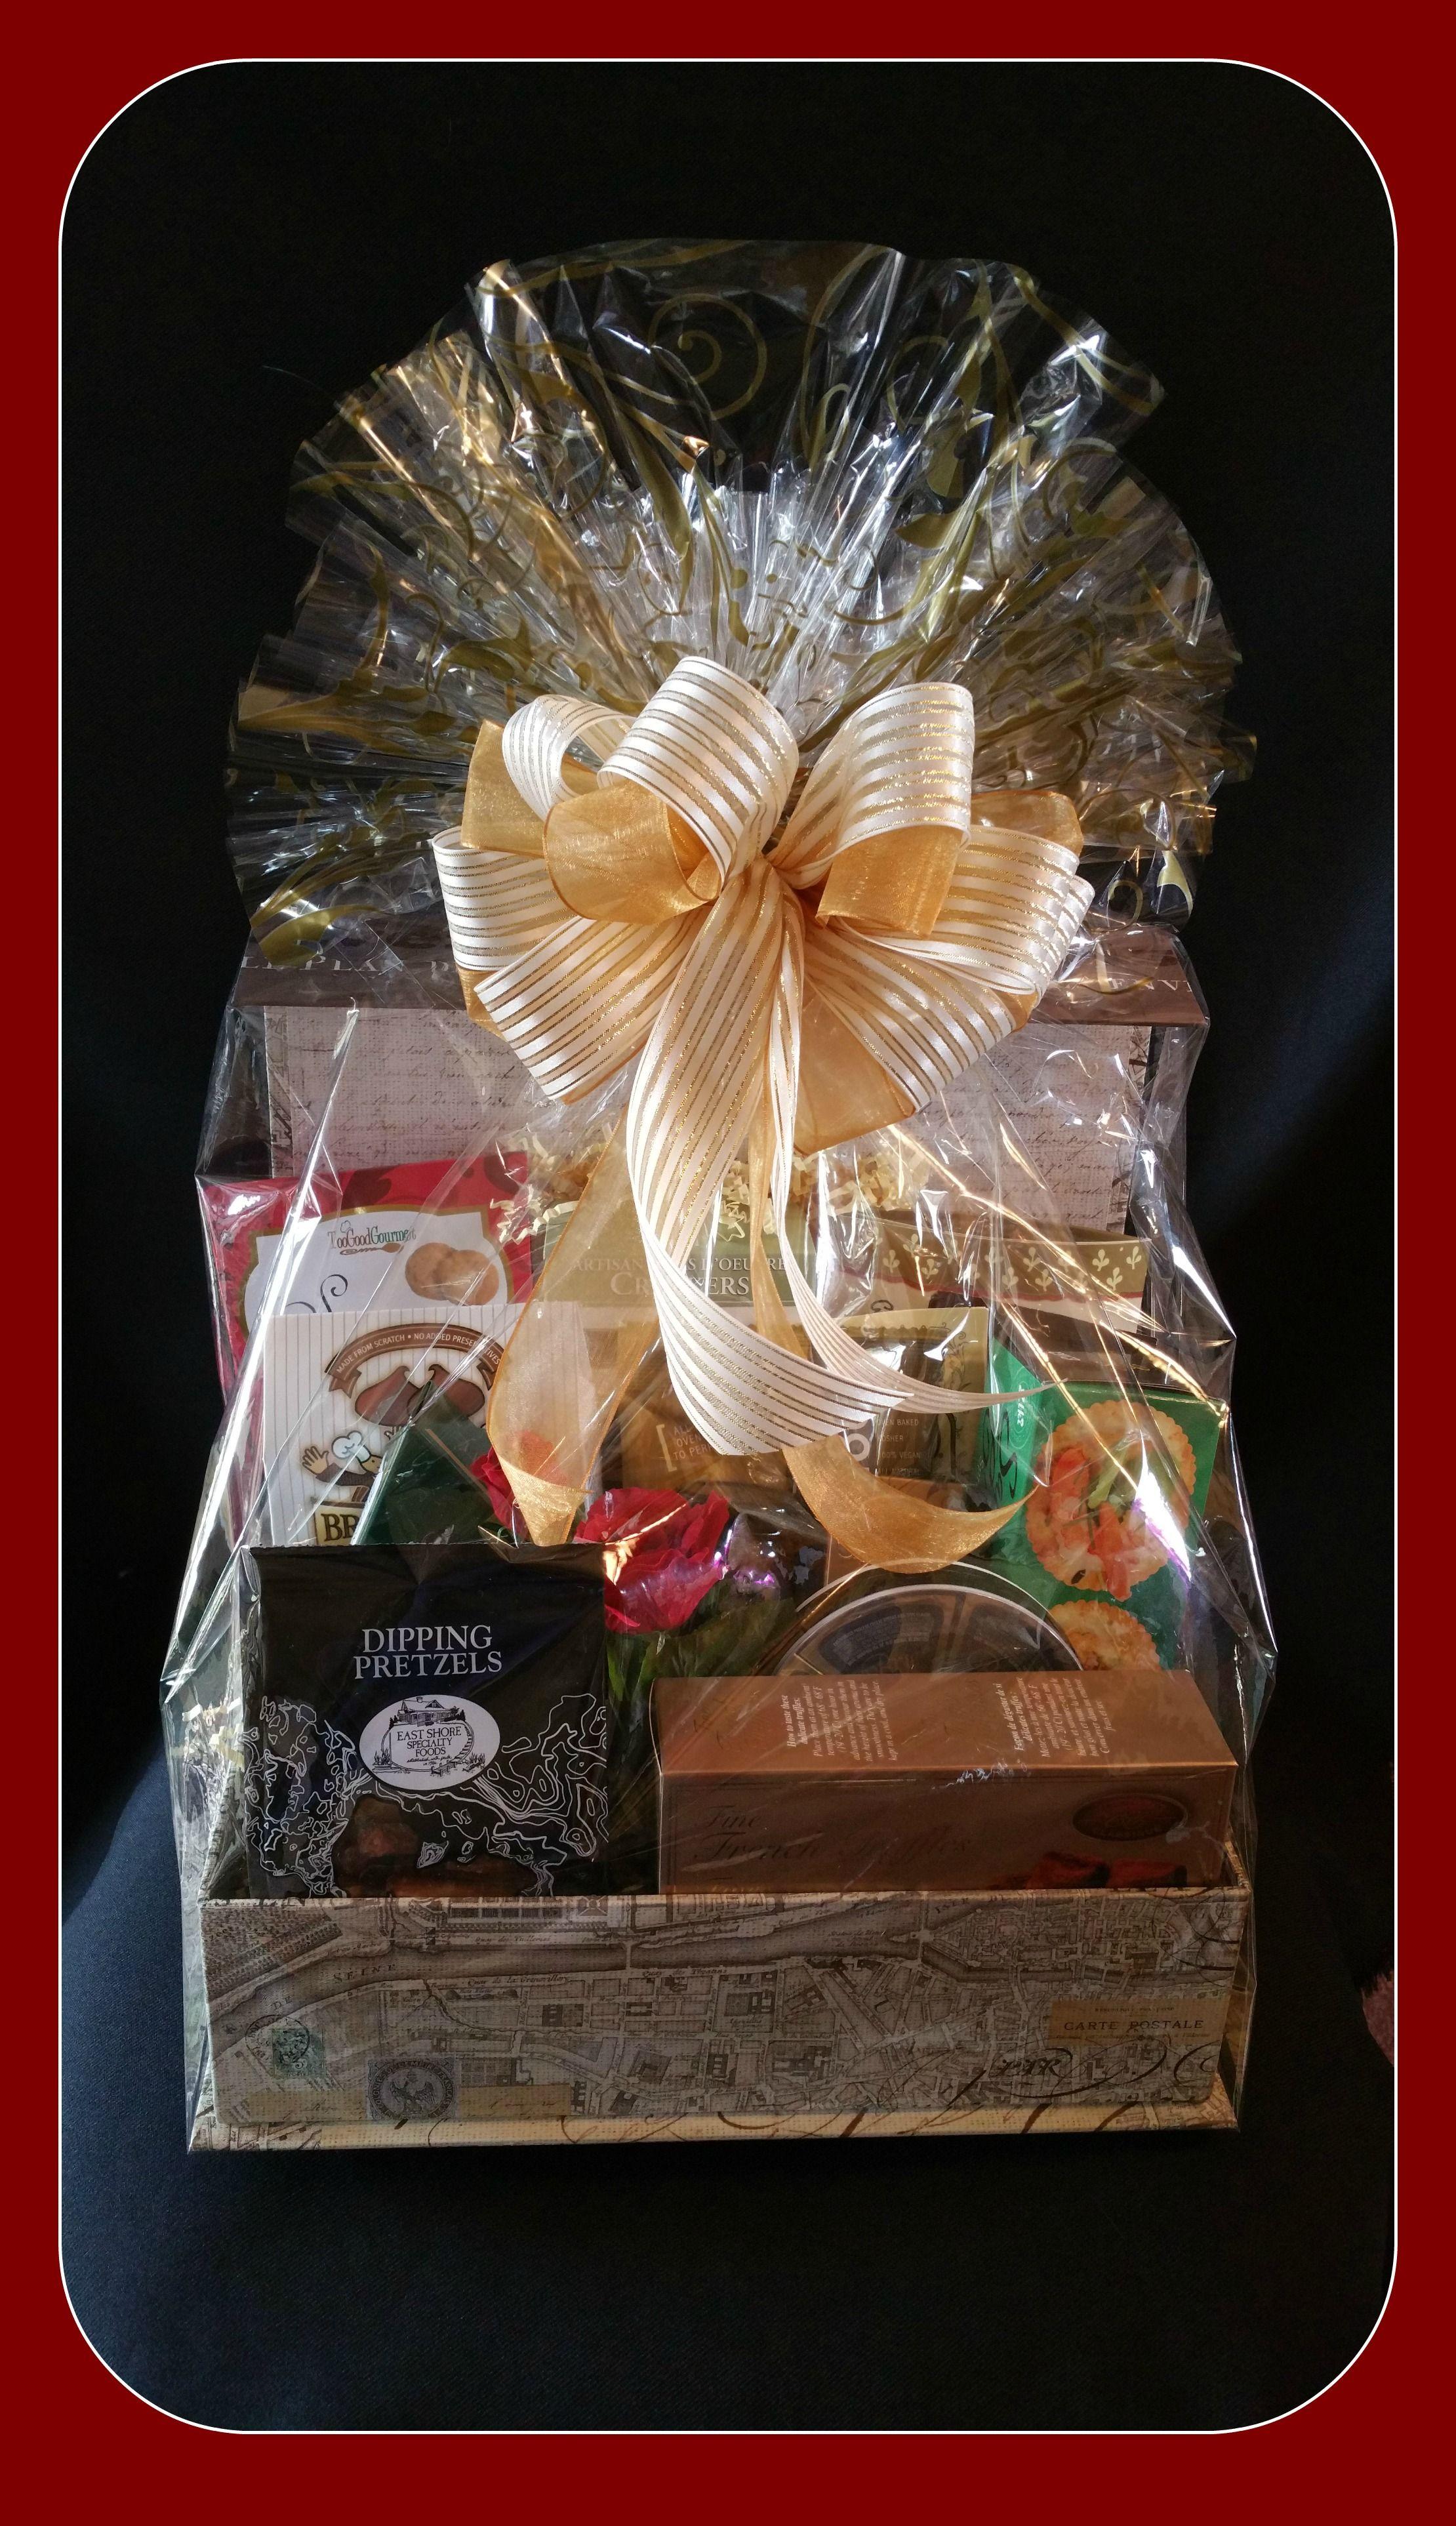 Corporate Keepsake Gift Box with various gourmet treats. & Corporate Keepsake Gift Box with various gourmet treats. | Gift ...